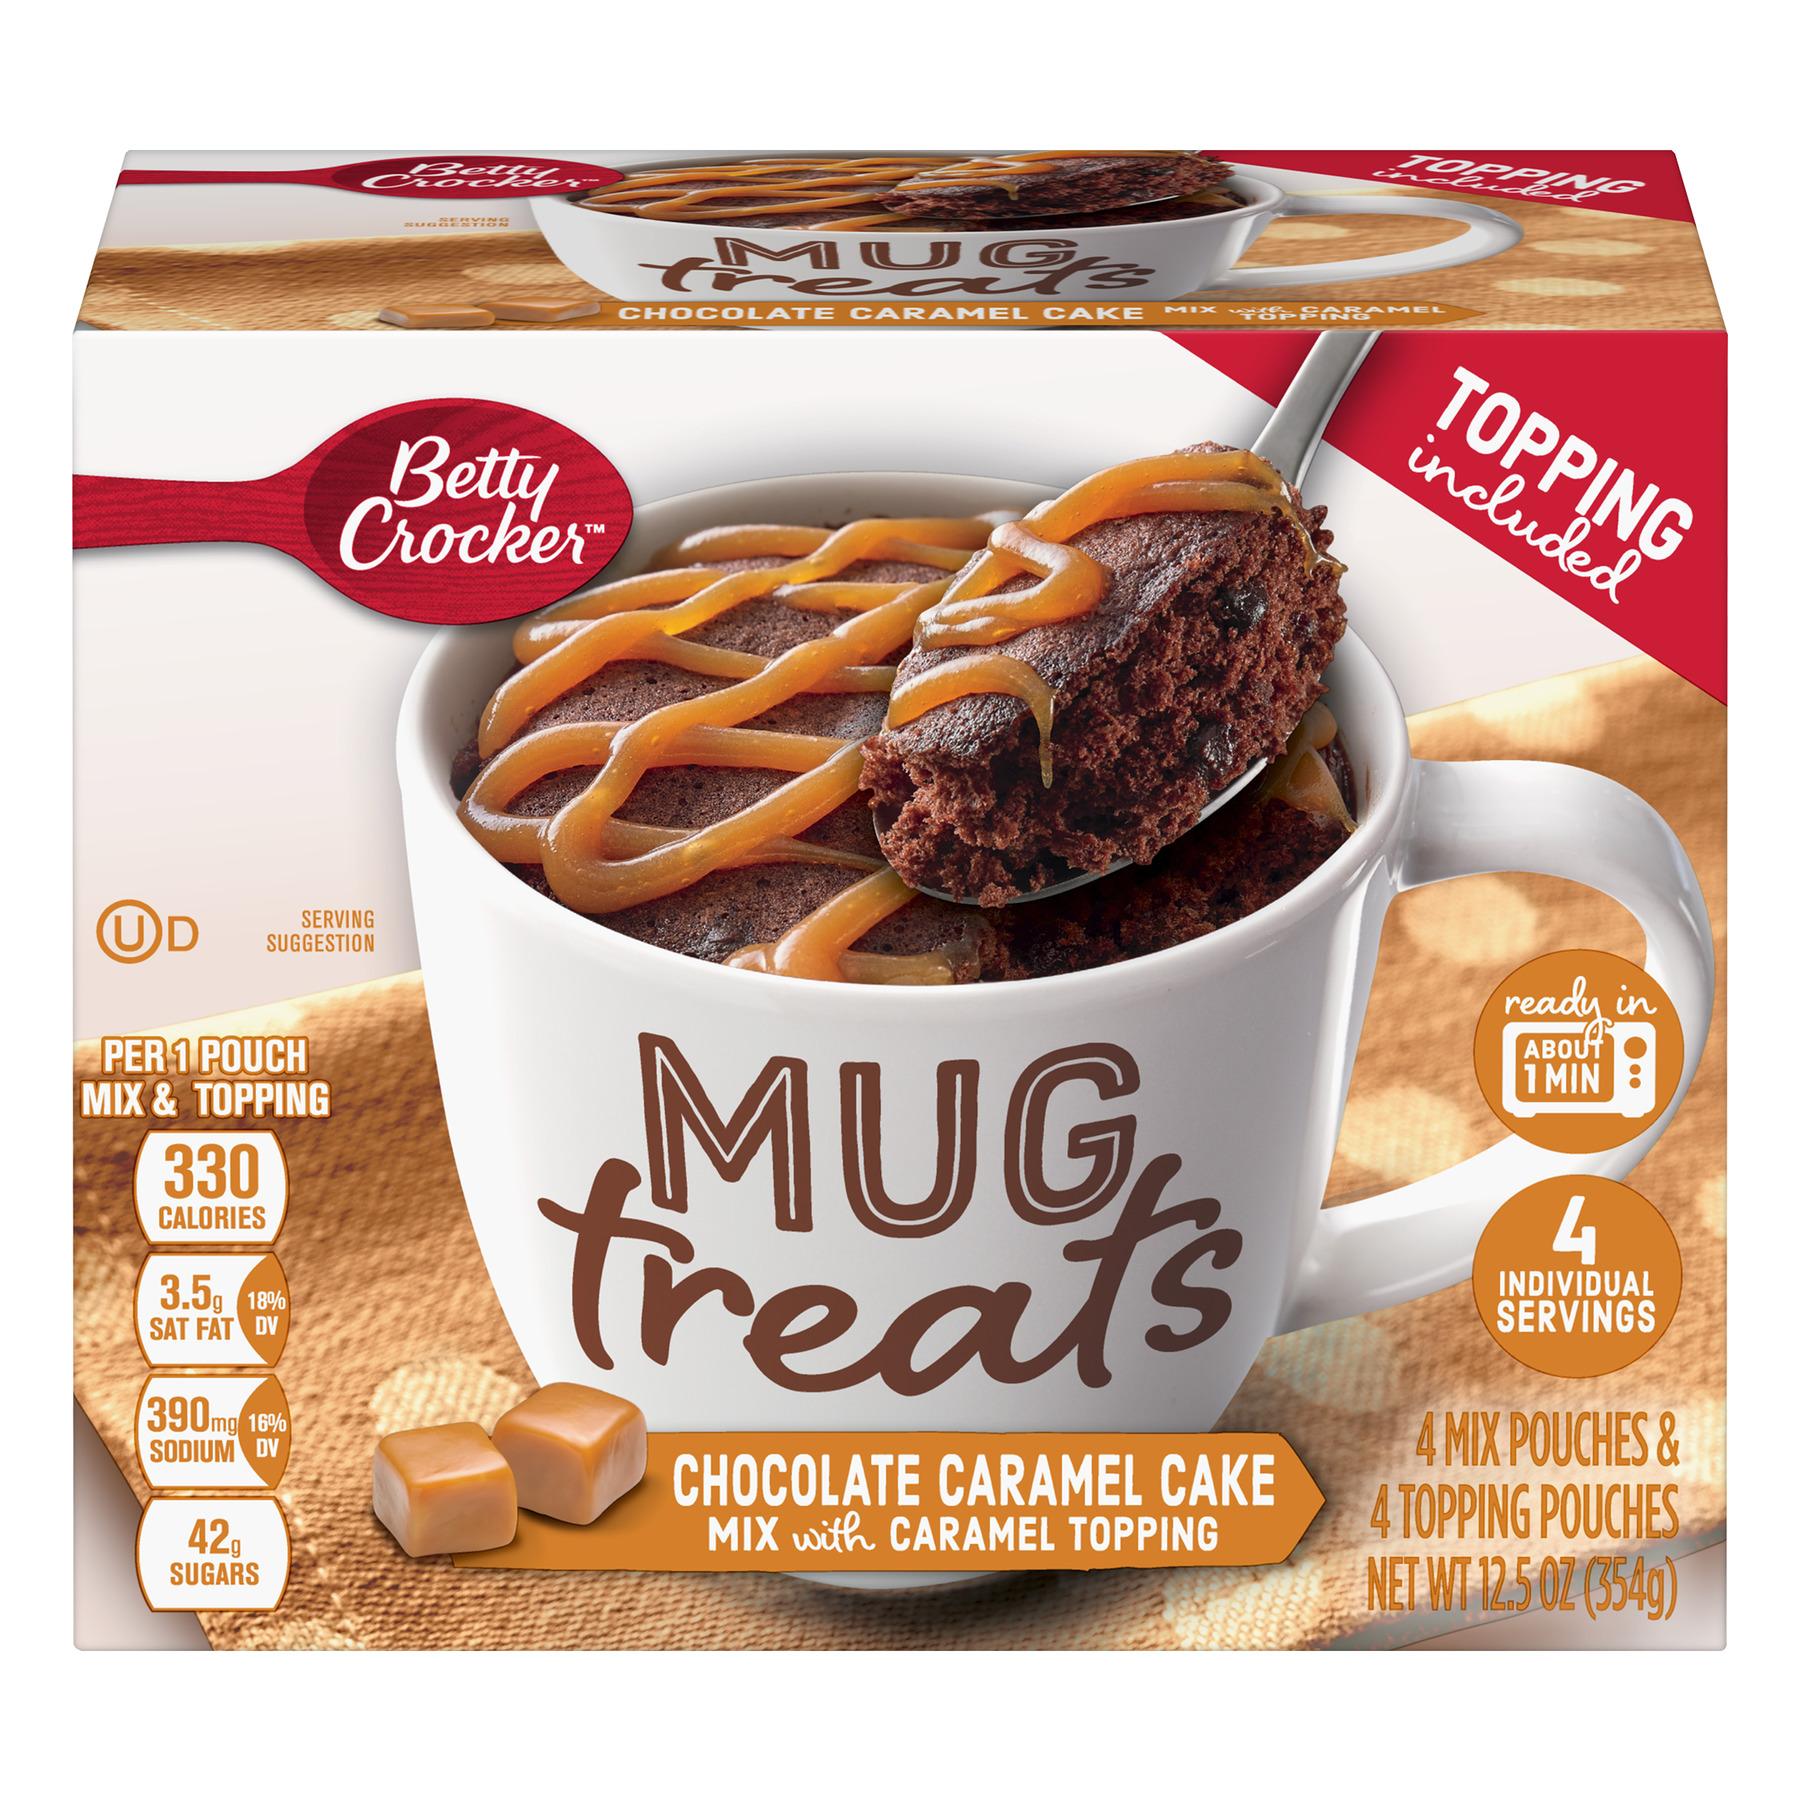 (3 Pack) Betty Crocker Chocolate Caramel Cake Mug Treats, 4 Pouches 12.5oz Box